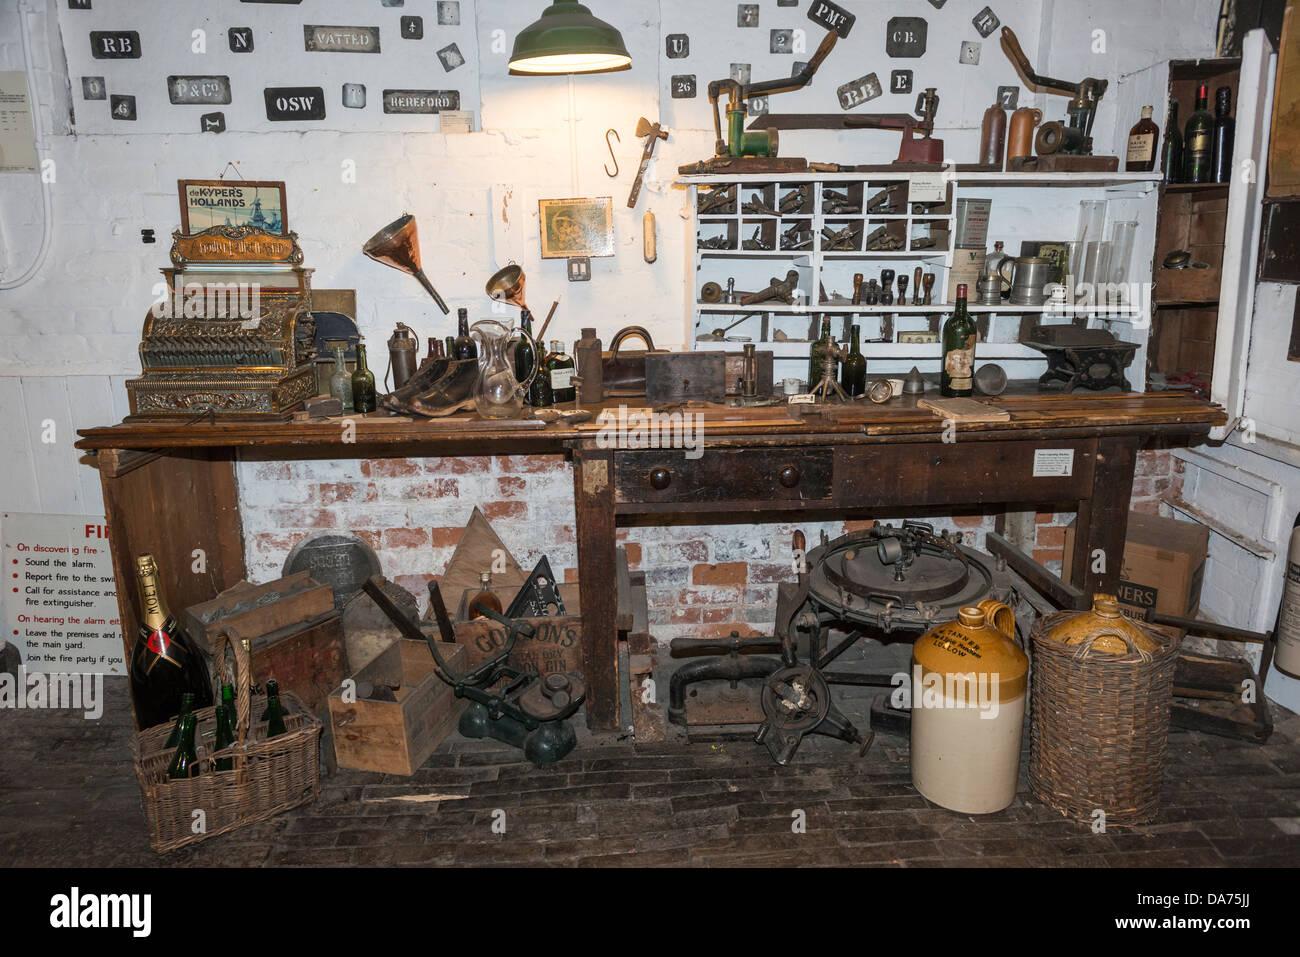 Tanners Wines Cellars Shop, Shrewsbury, Shropshire - Stock Image